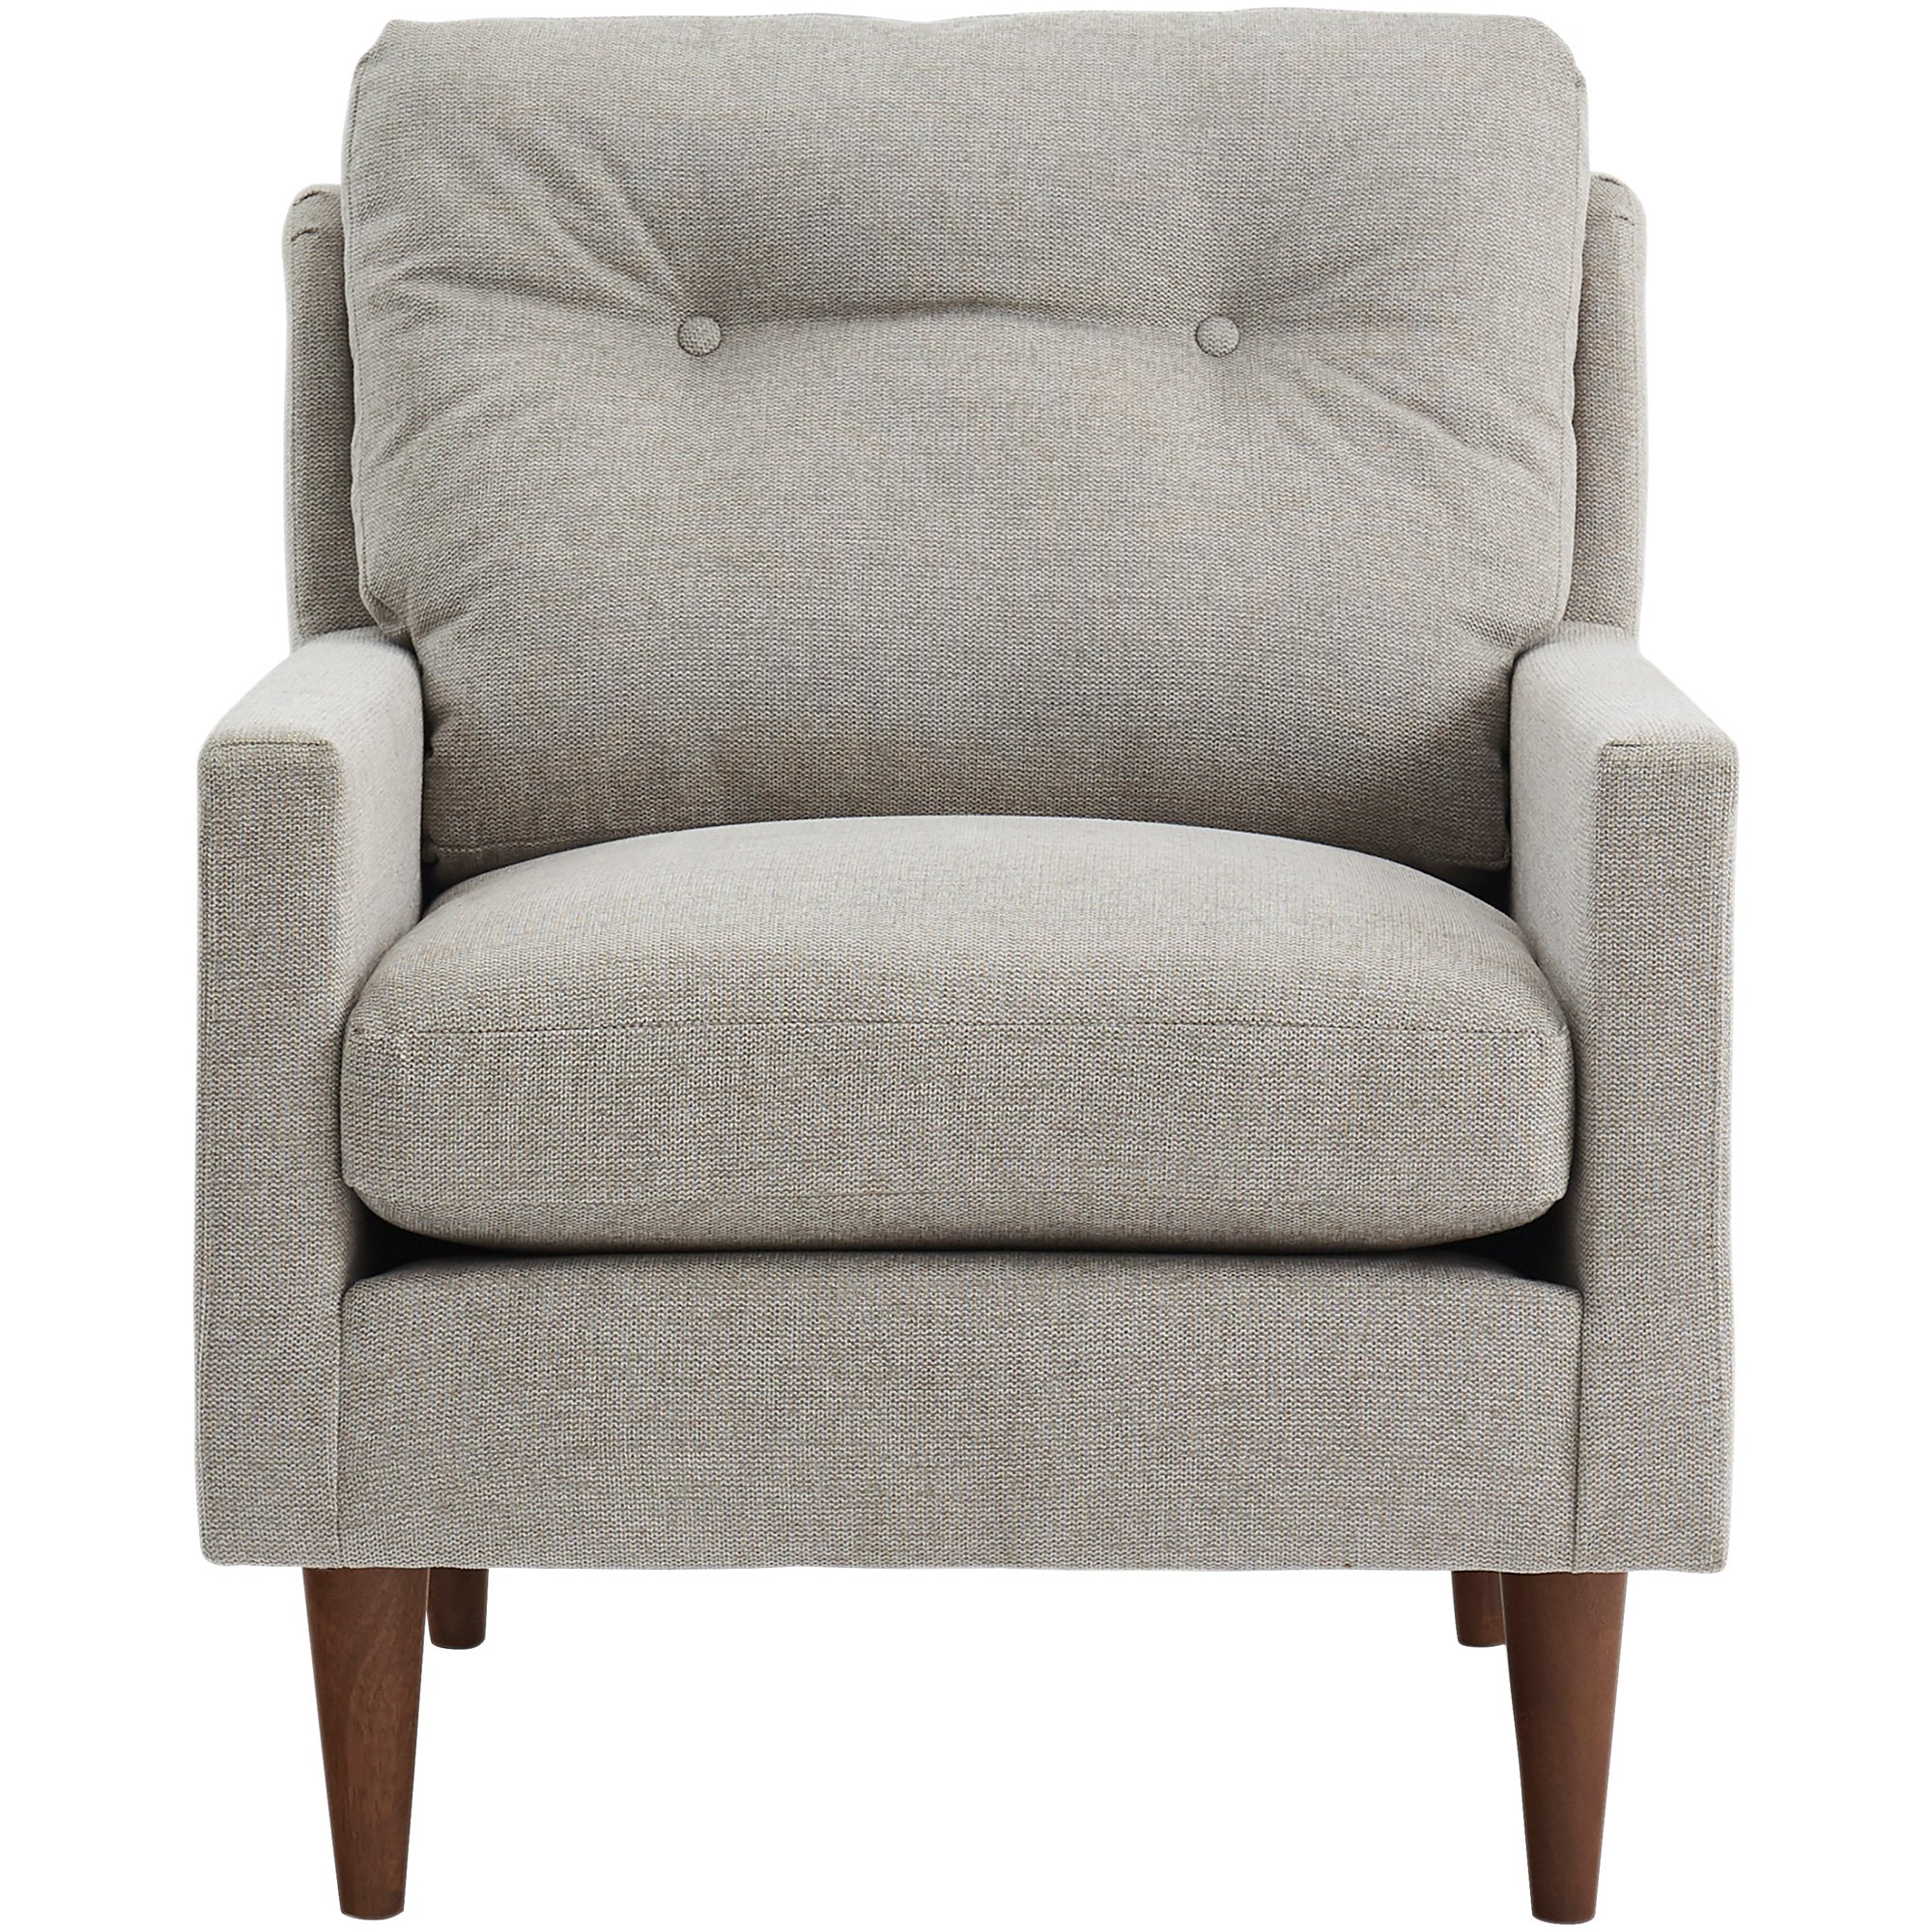 Best Home Furnishings | Trevin Slate Chair